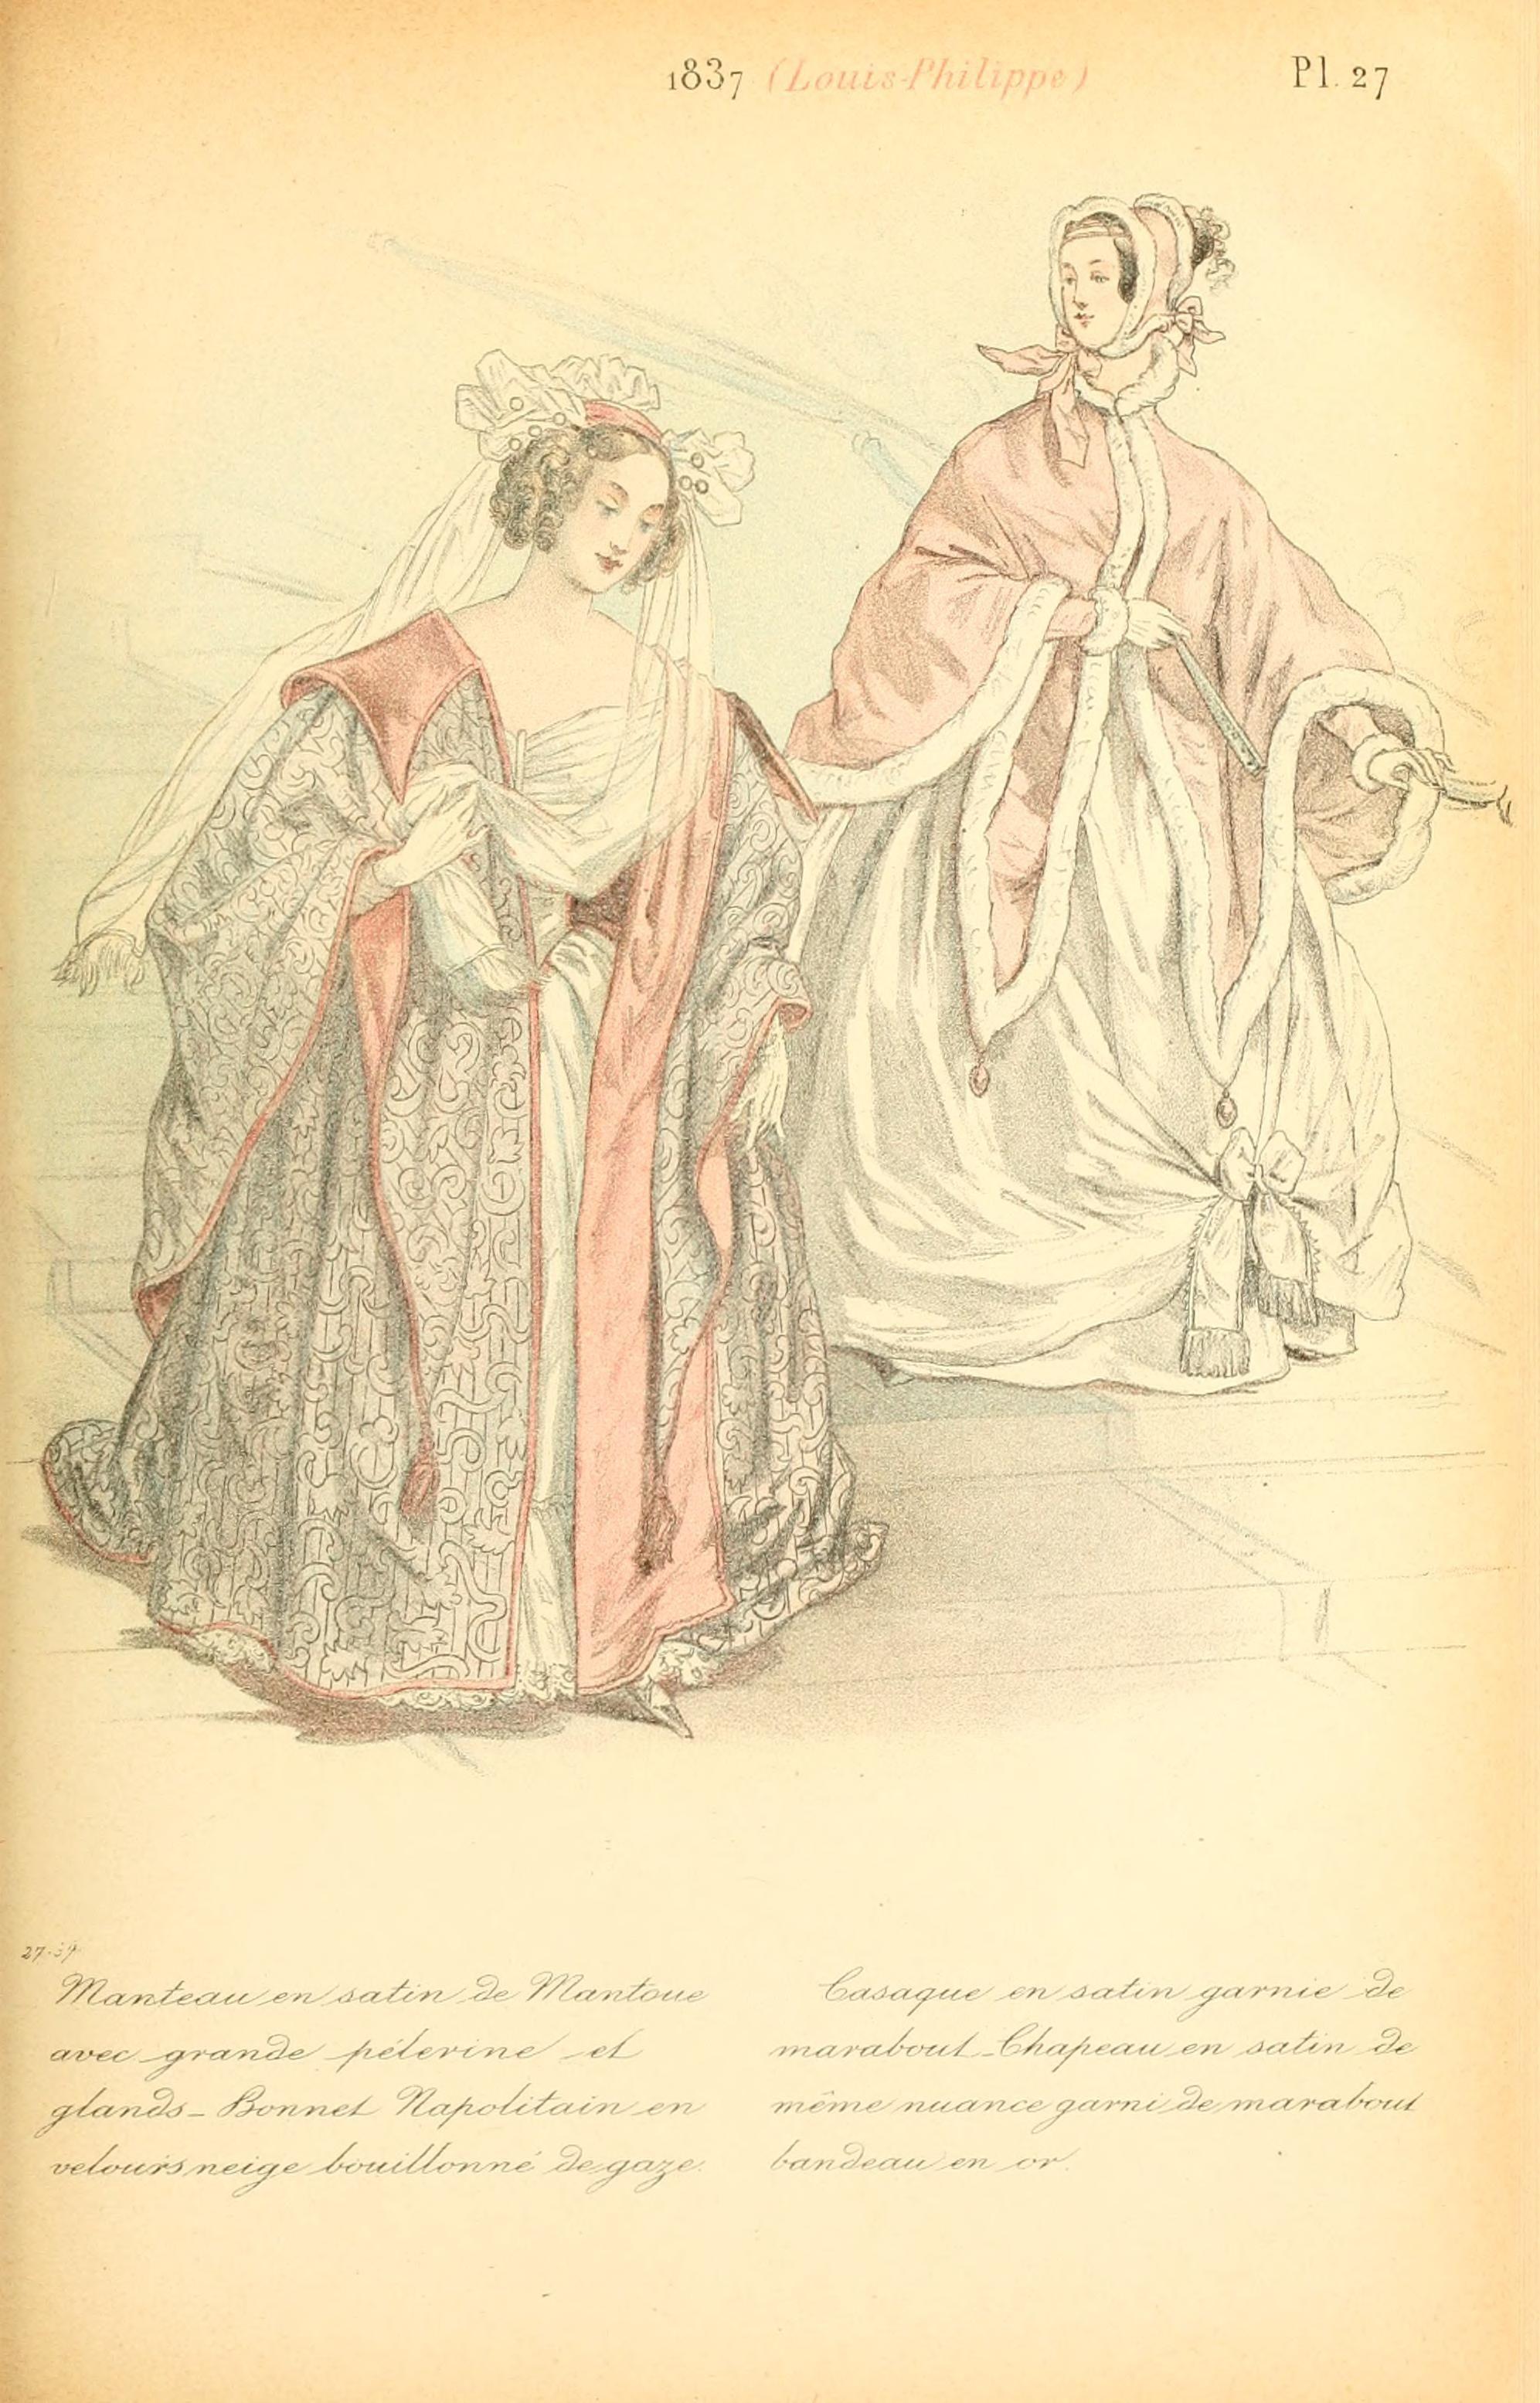 French high fashion house est 1837 73